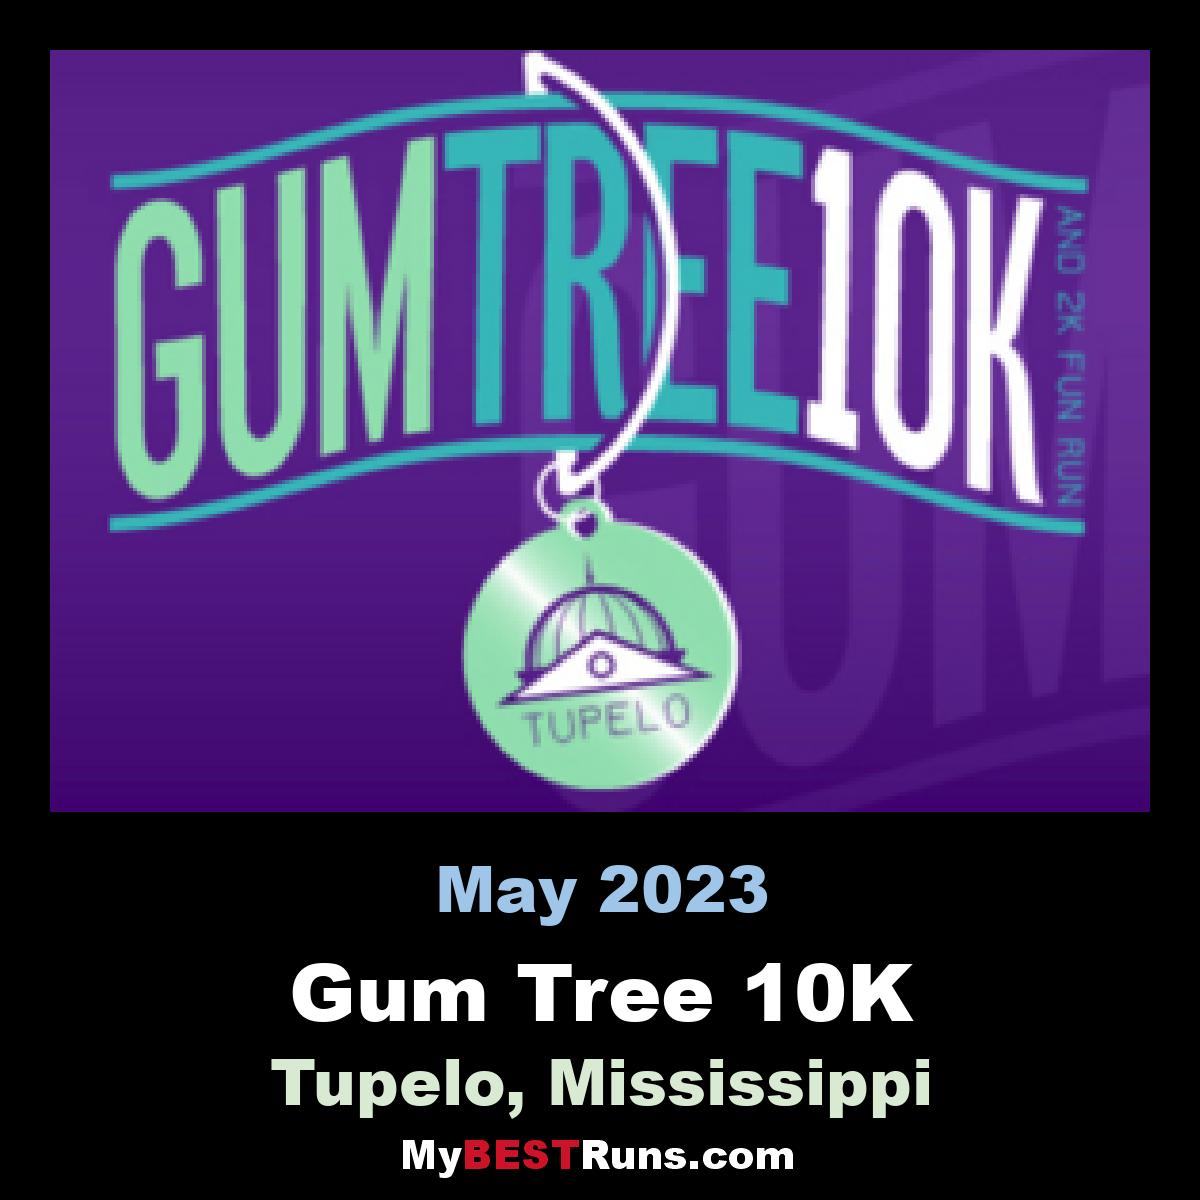 Gum Tree 10K